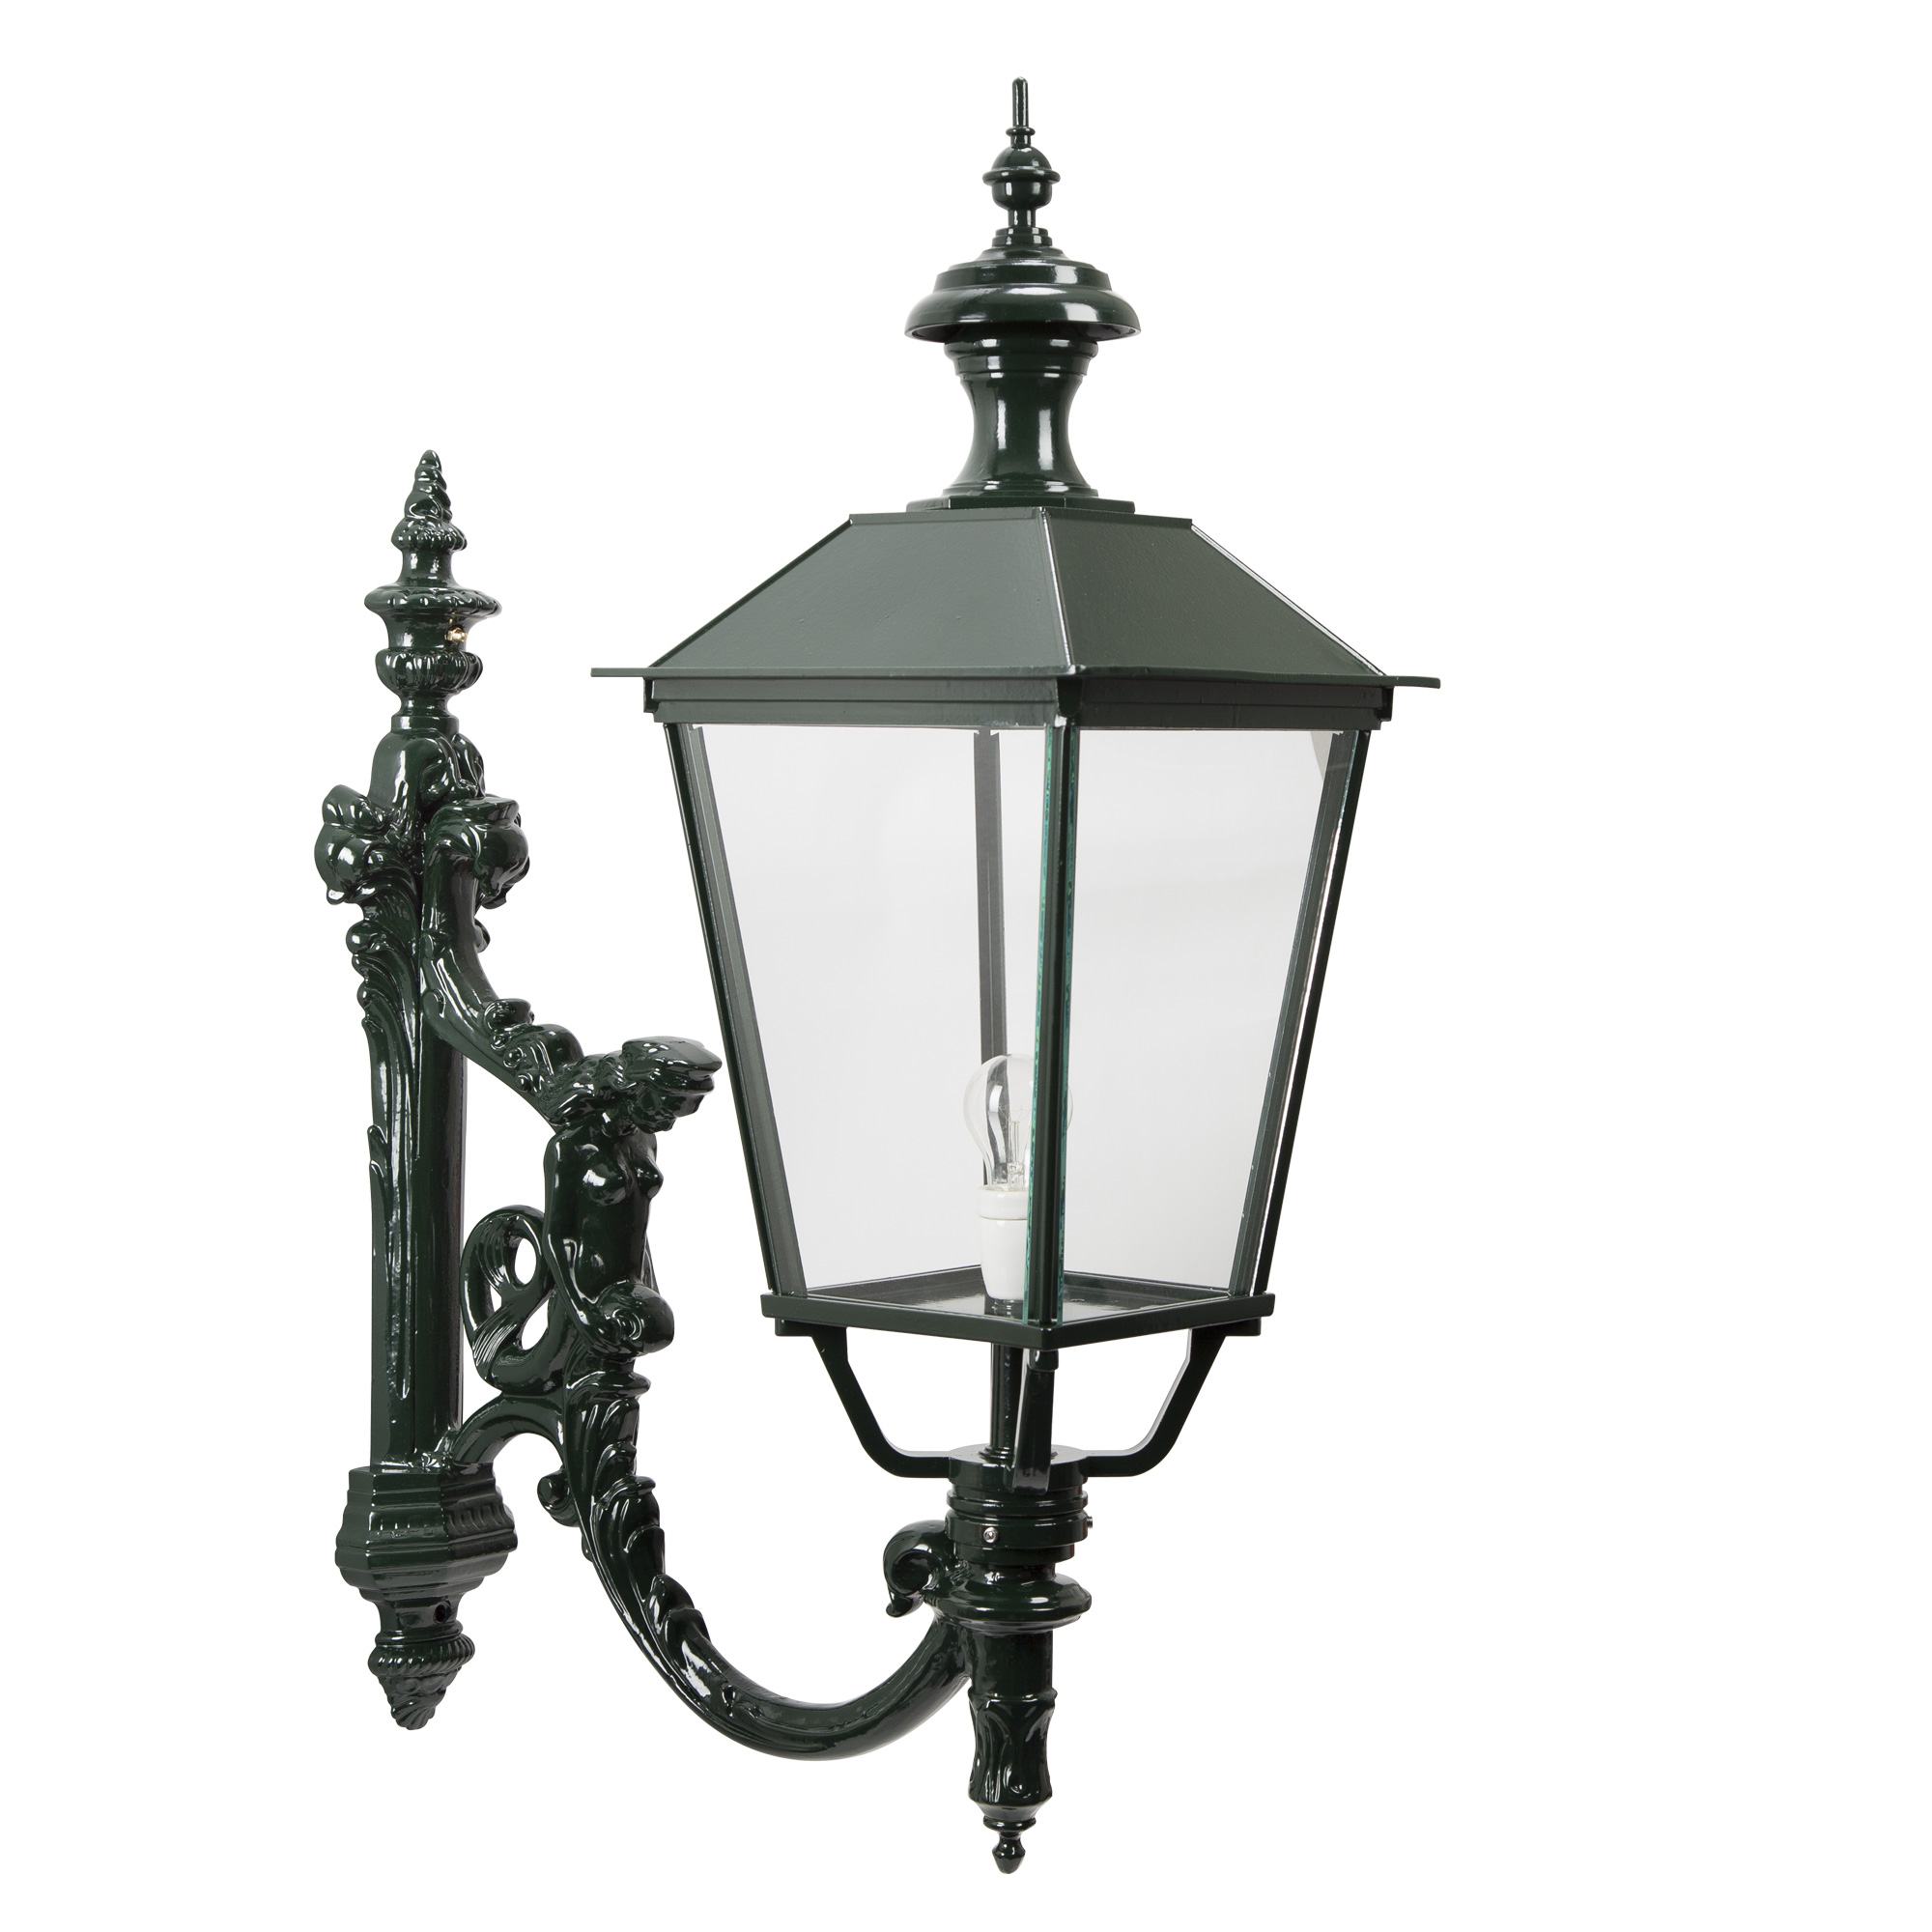 Muurlamp Charles XL